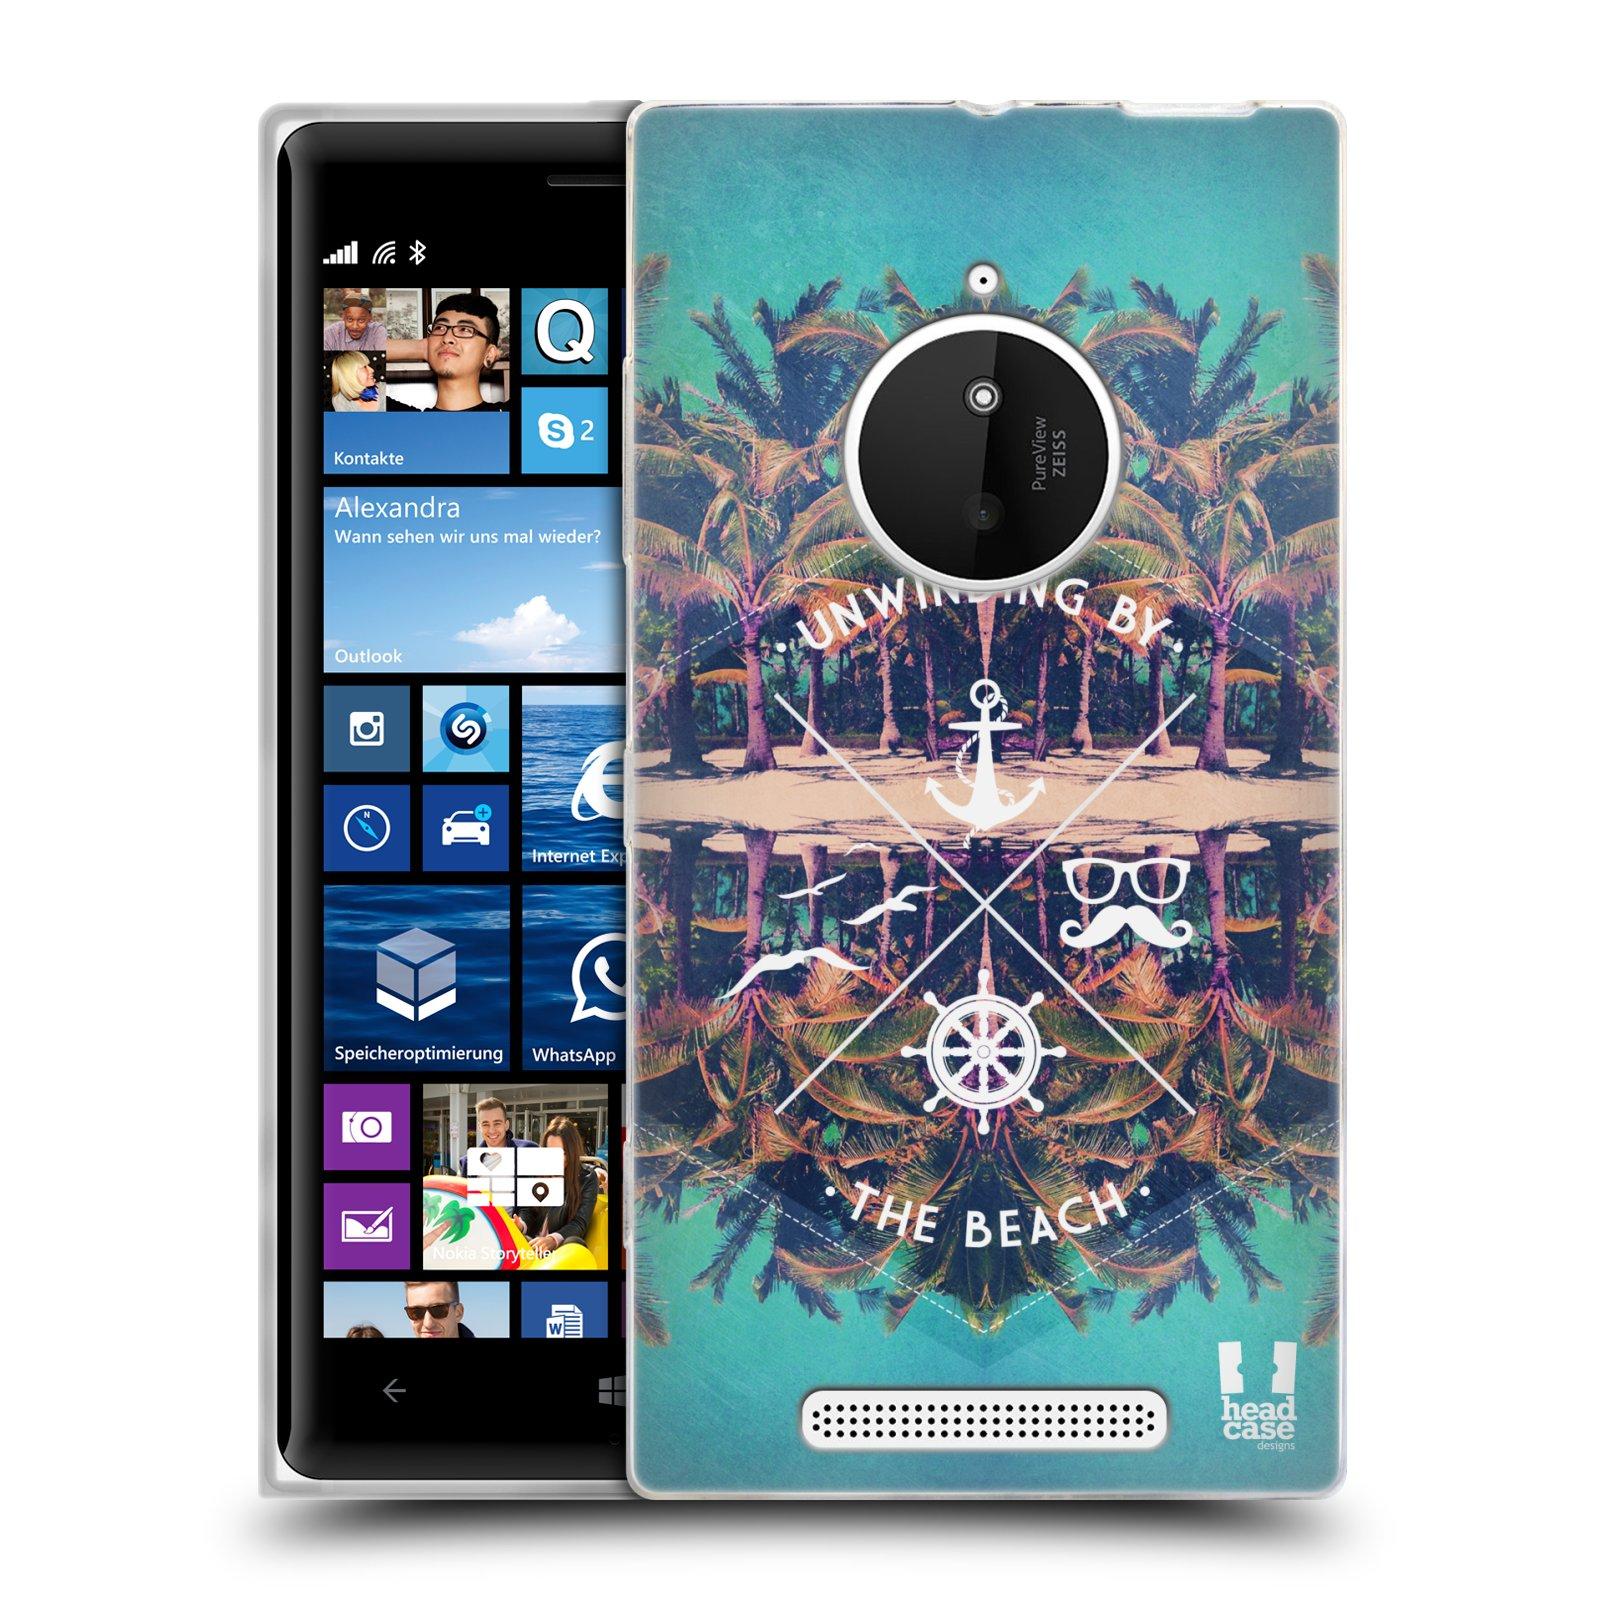 Silikonové pouzdro na mobil Nokia Lumia 830 HEAD CASE Bezvětří (Silikonový kryt či obal na mobilní telefon Nokia Lumia 830)